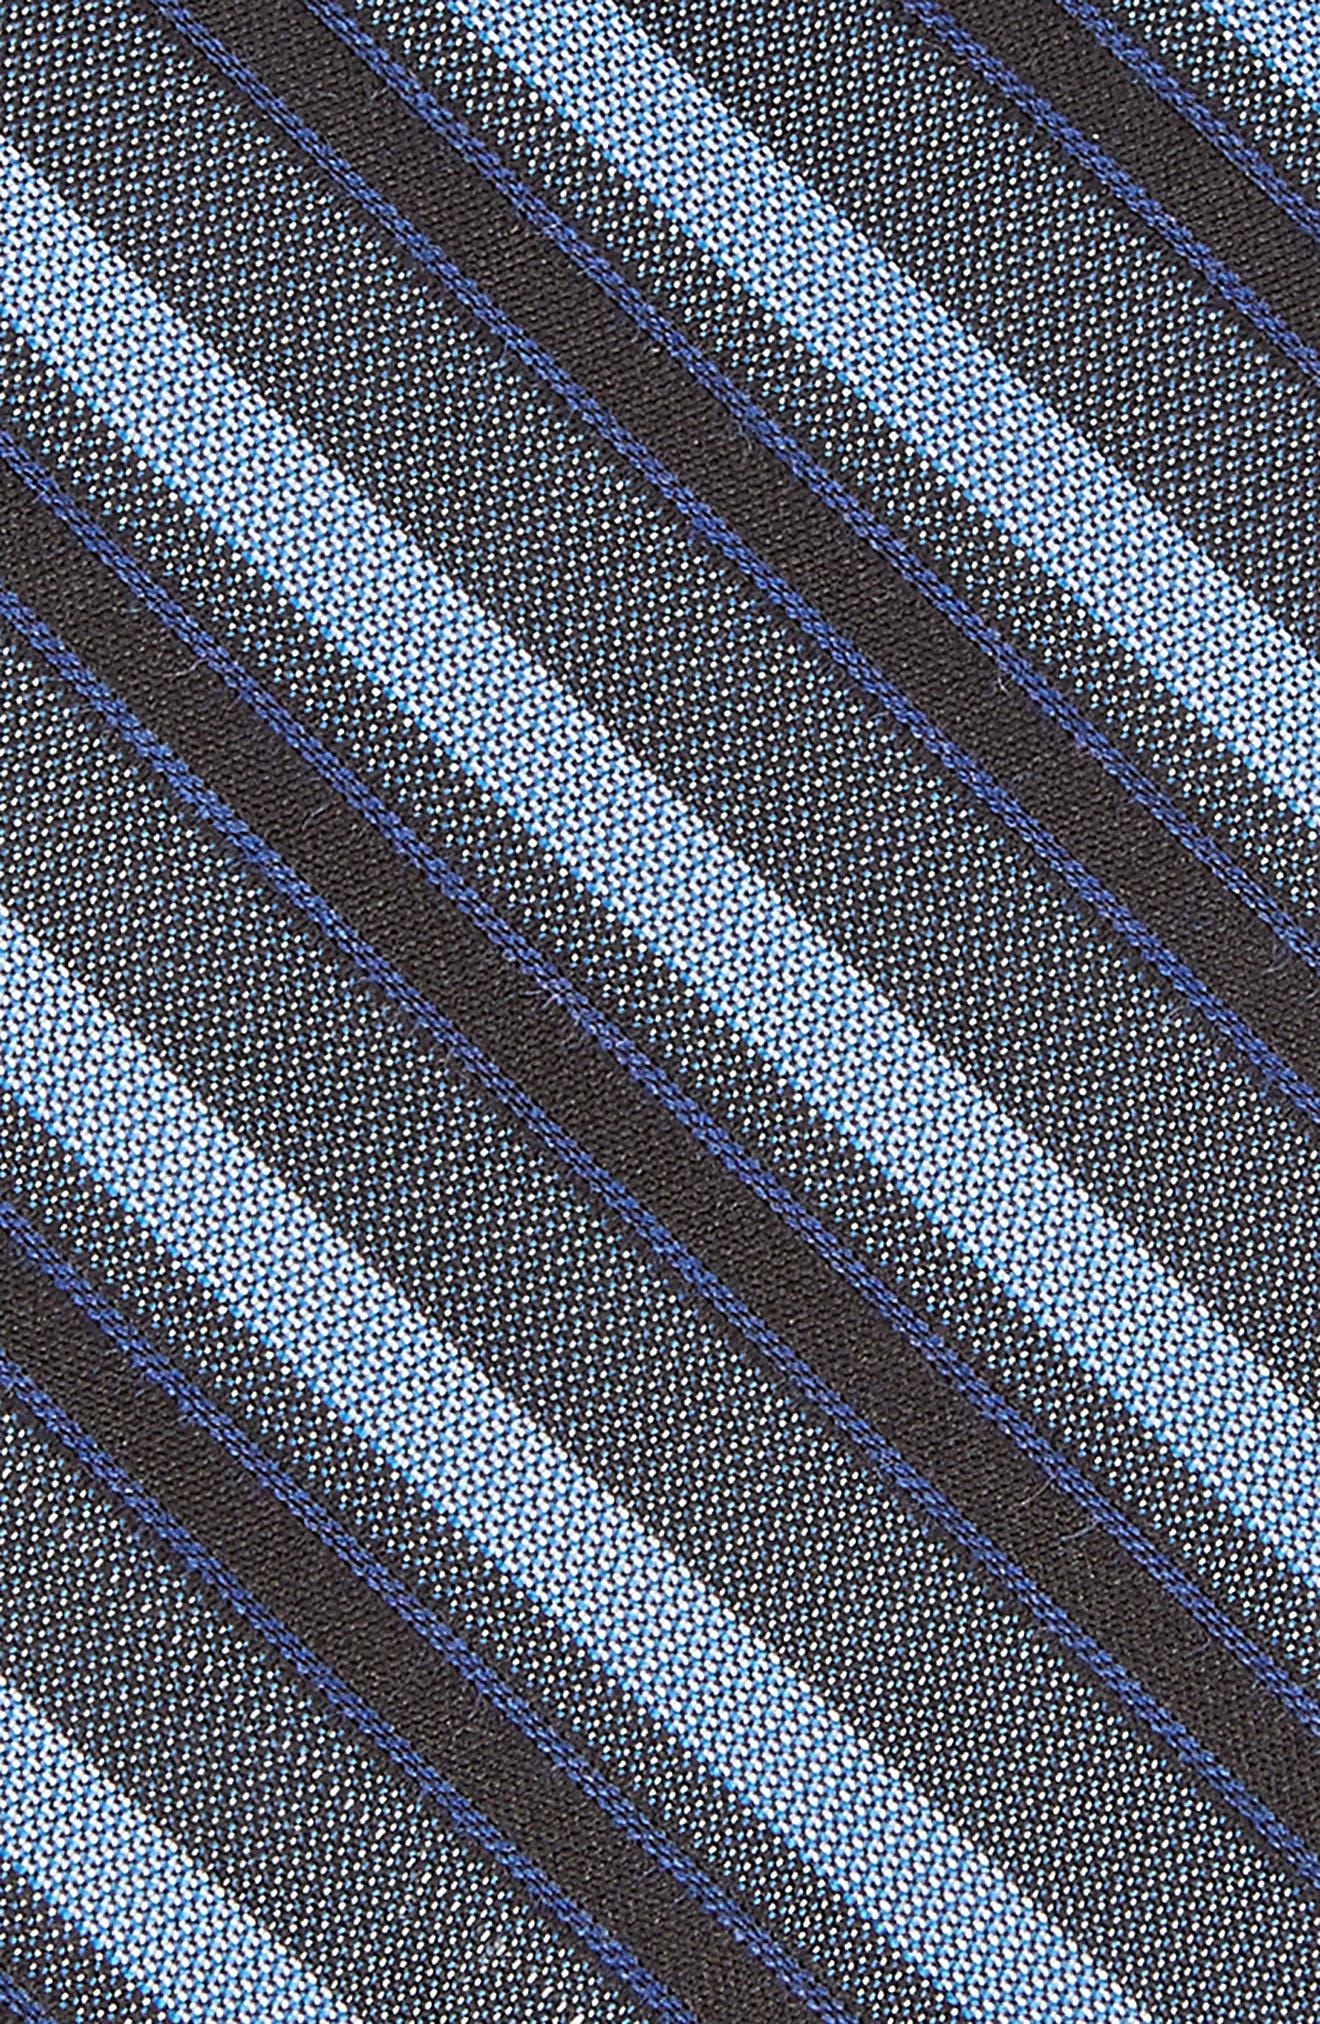 Shadow Stripe Tie,                             Alternate thumbnail 2, color,                             411